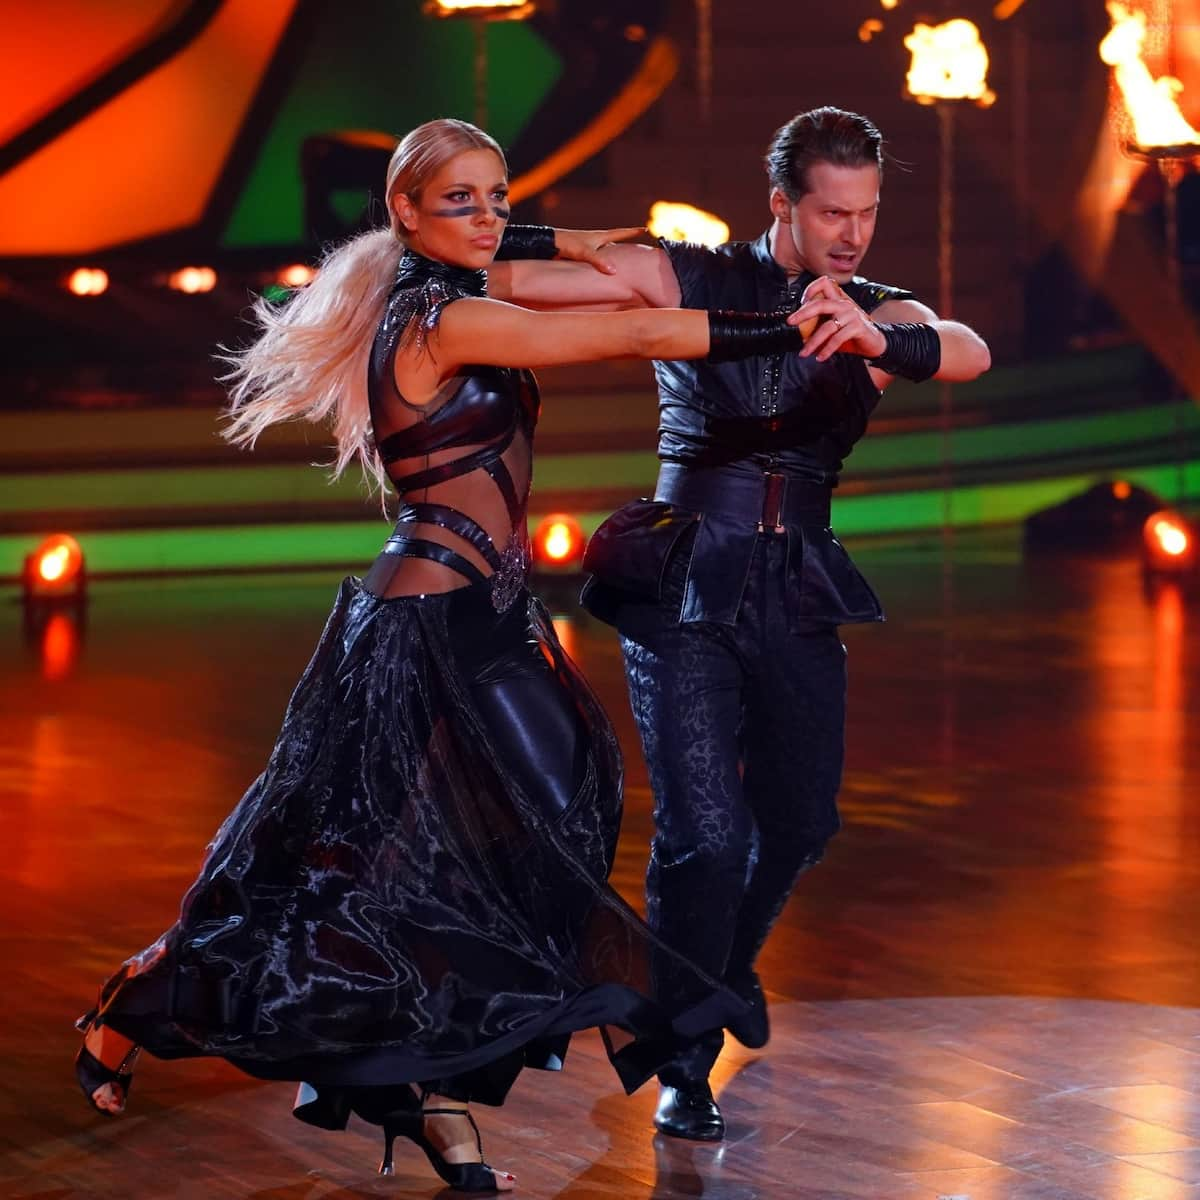 Valentina Pahde - Valentin Lusin Let's dance am 21.5.2021